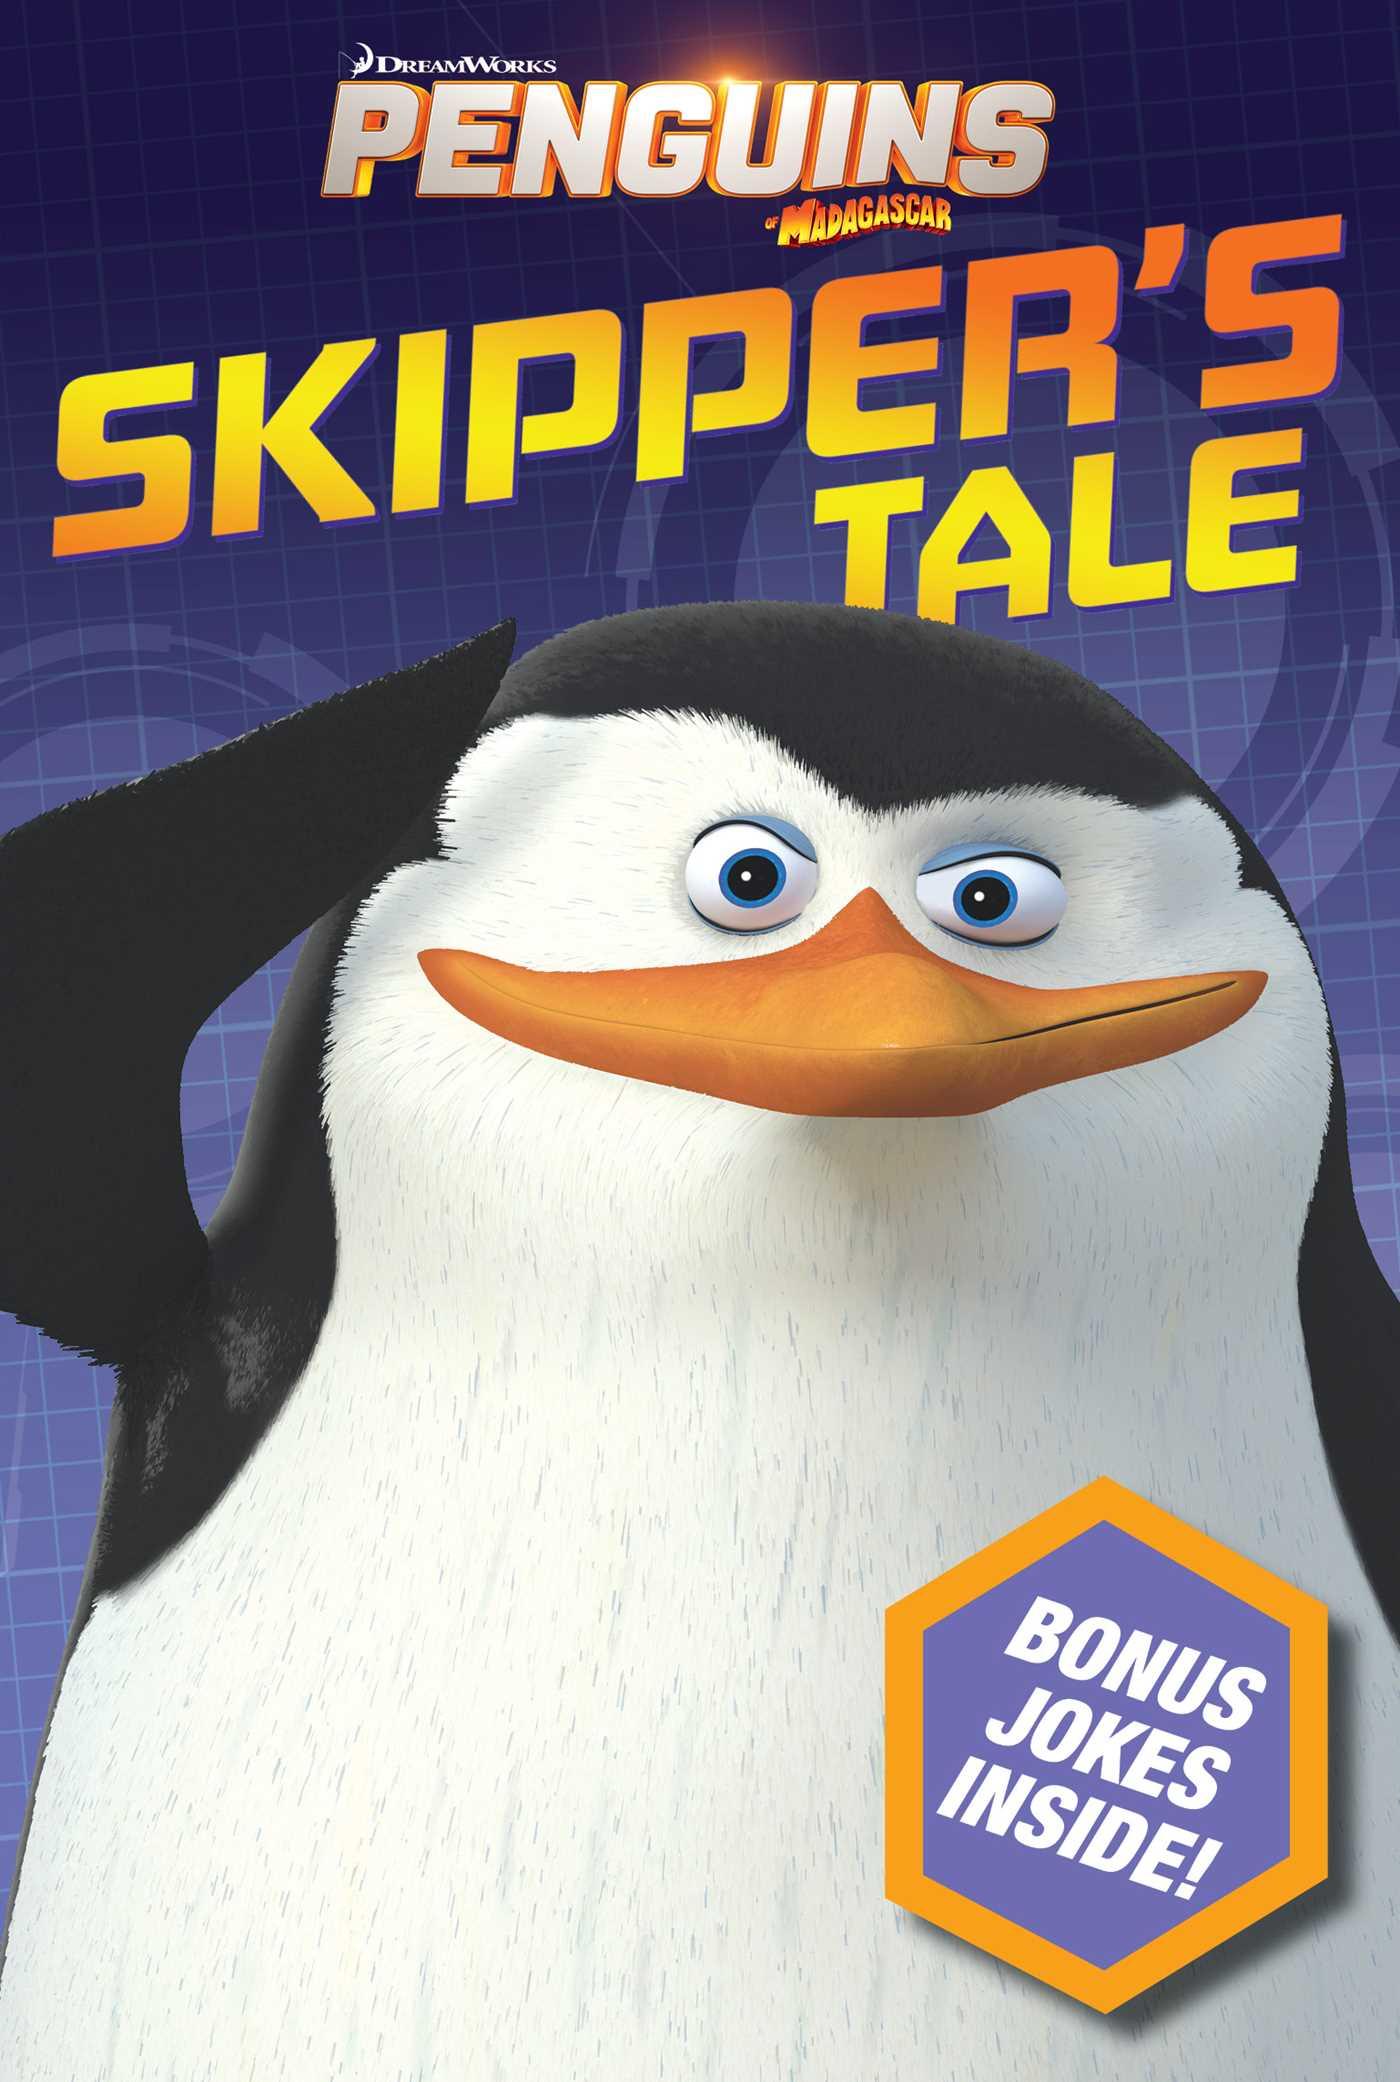 Skippers tale 9781481437387 hr